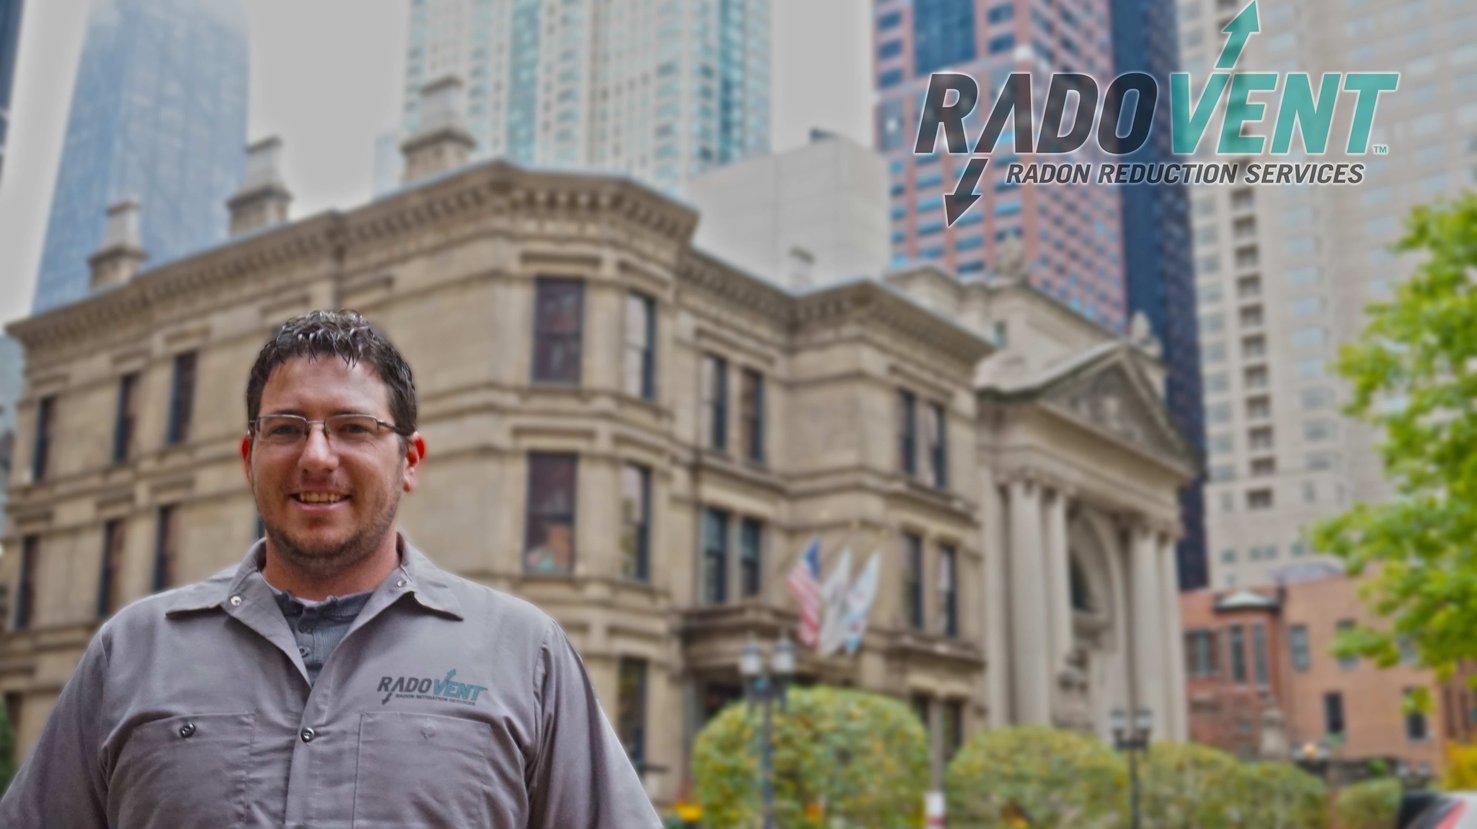 Il Radon Mitigation Contractor Illinois Best Radon